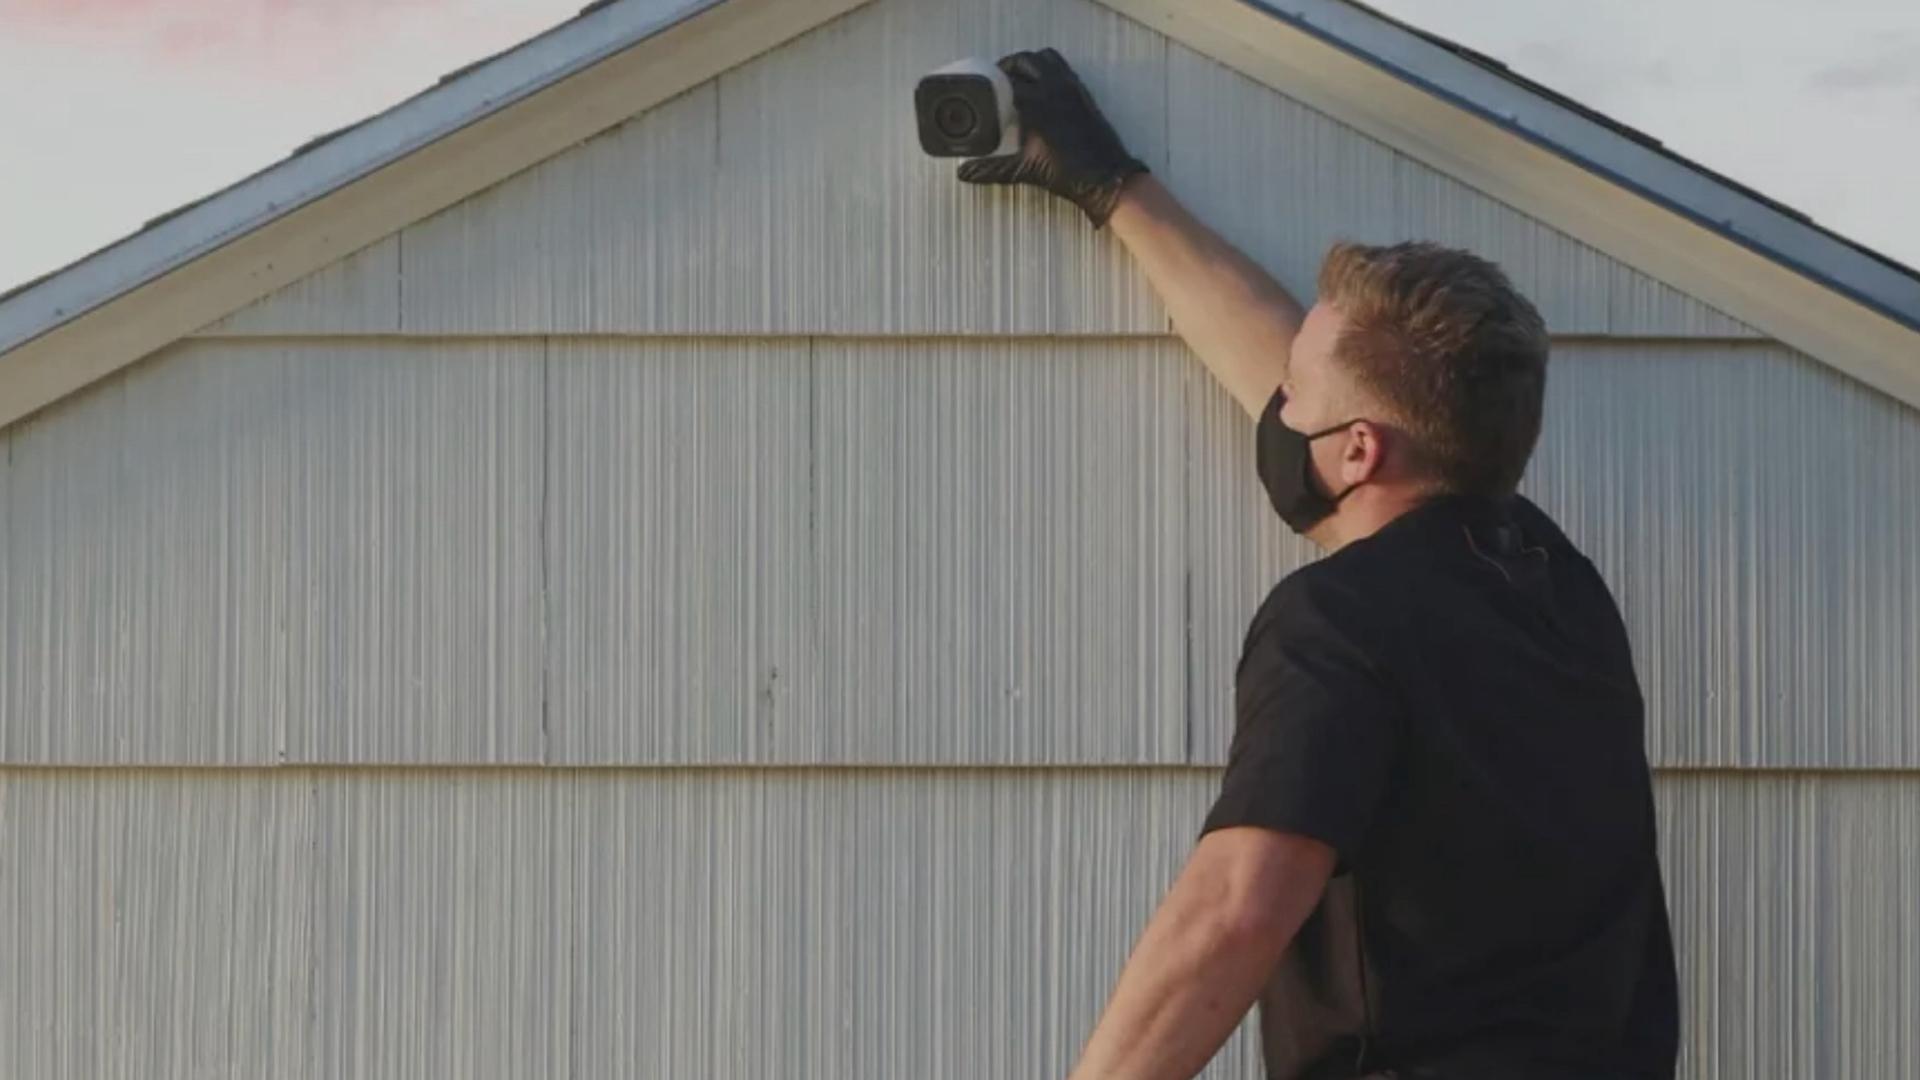 Man installing a Vivint camera